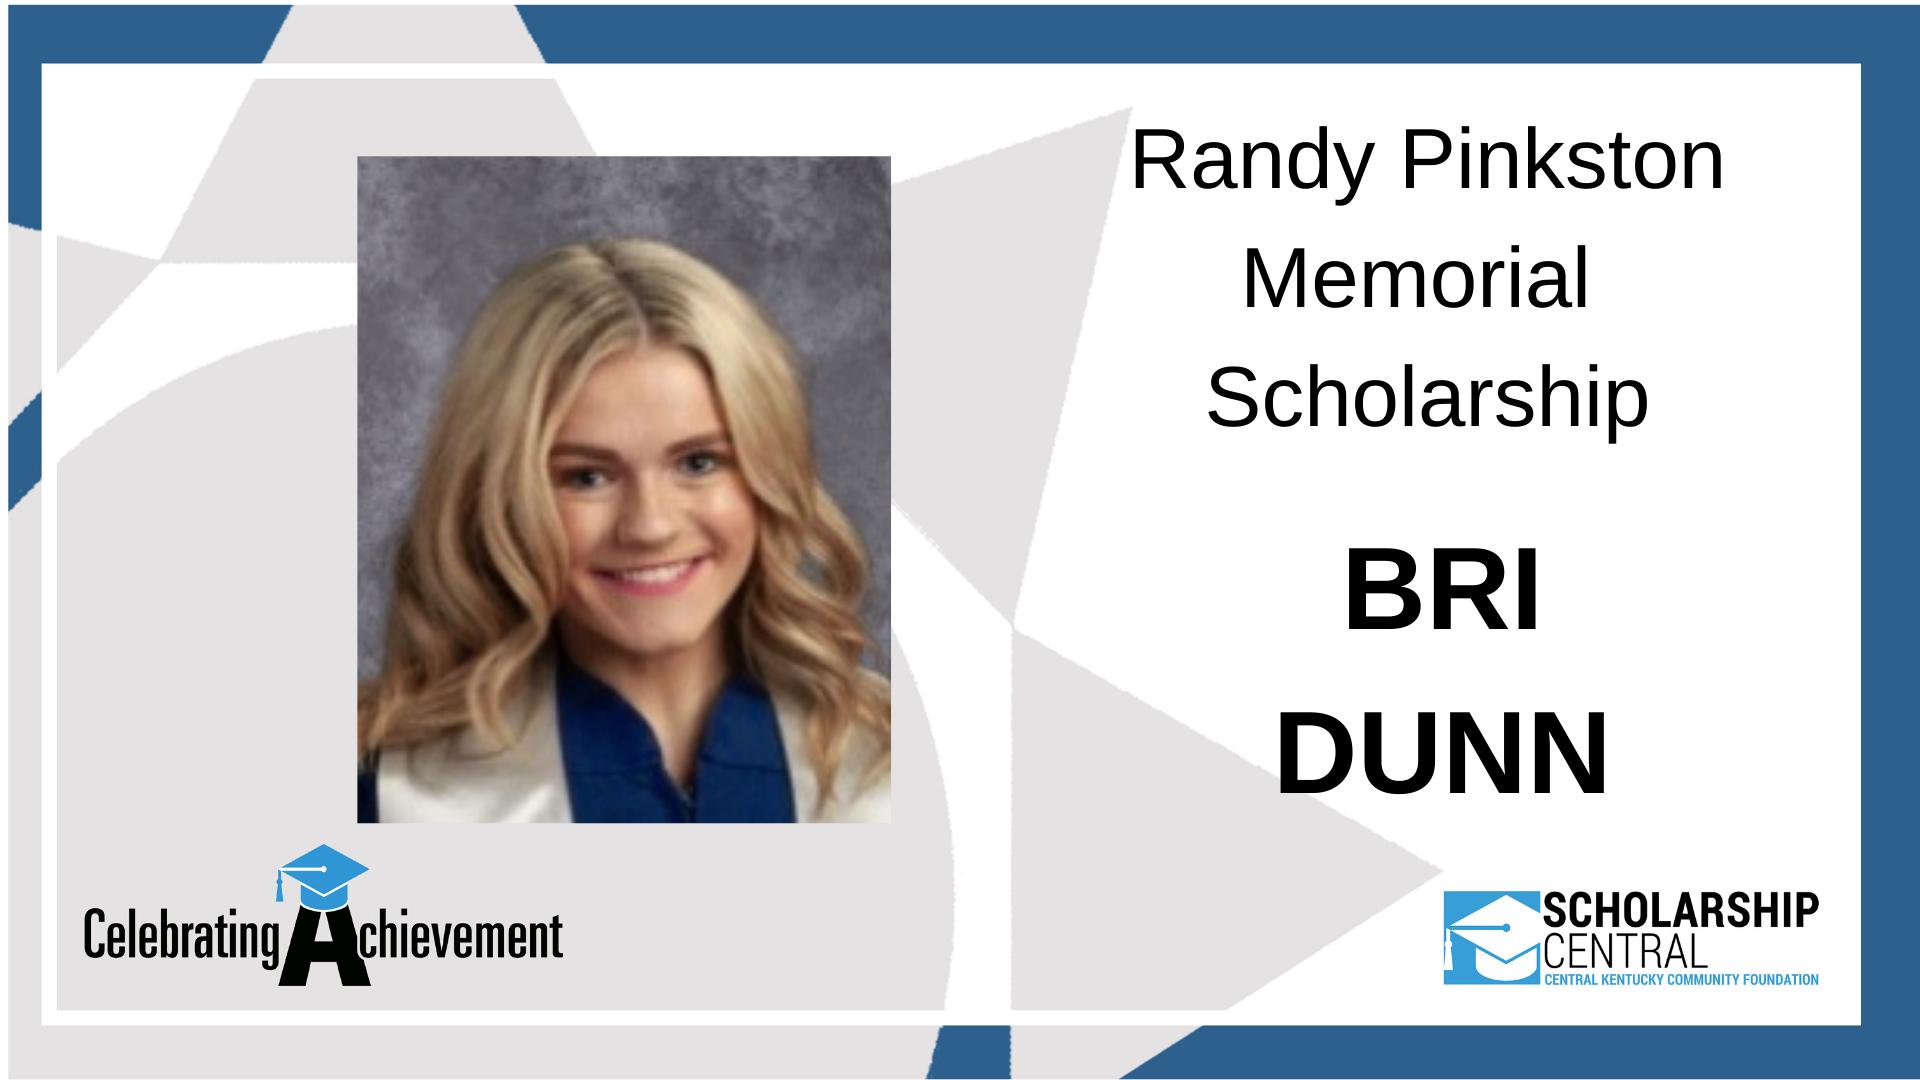 Randy Pinkston Scholarship